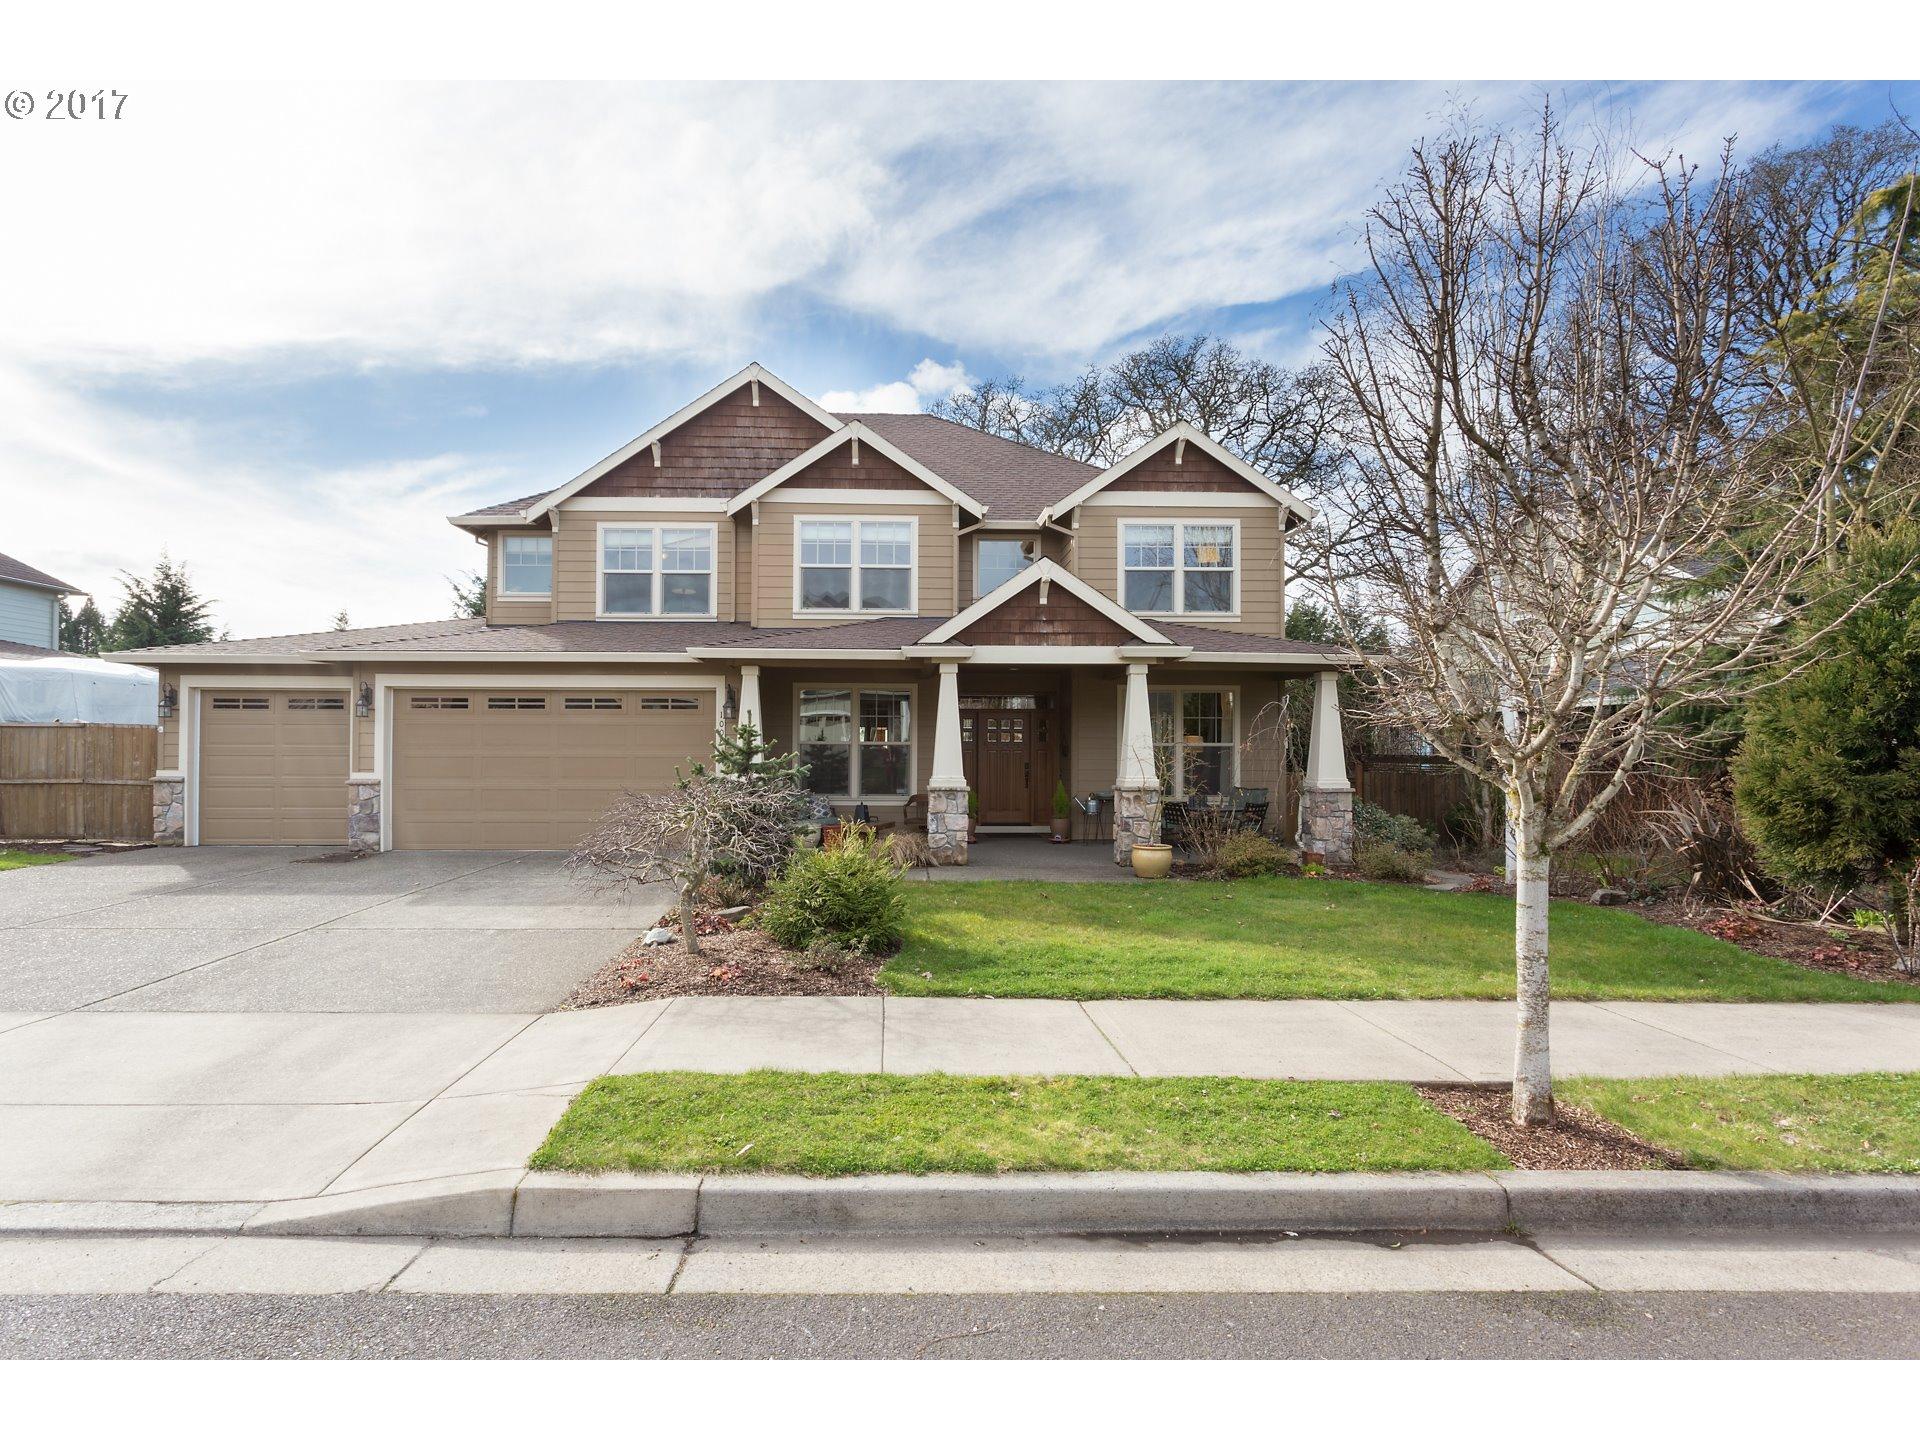 1008 JOSEPHINE ST, Oregon City, OR 97045